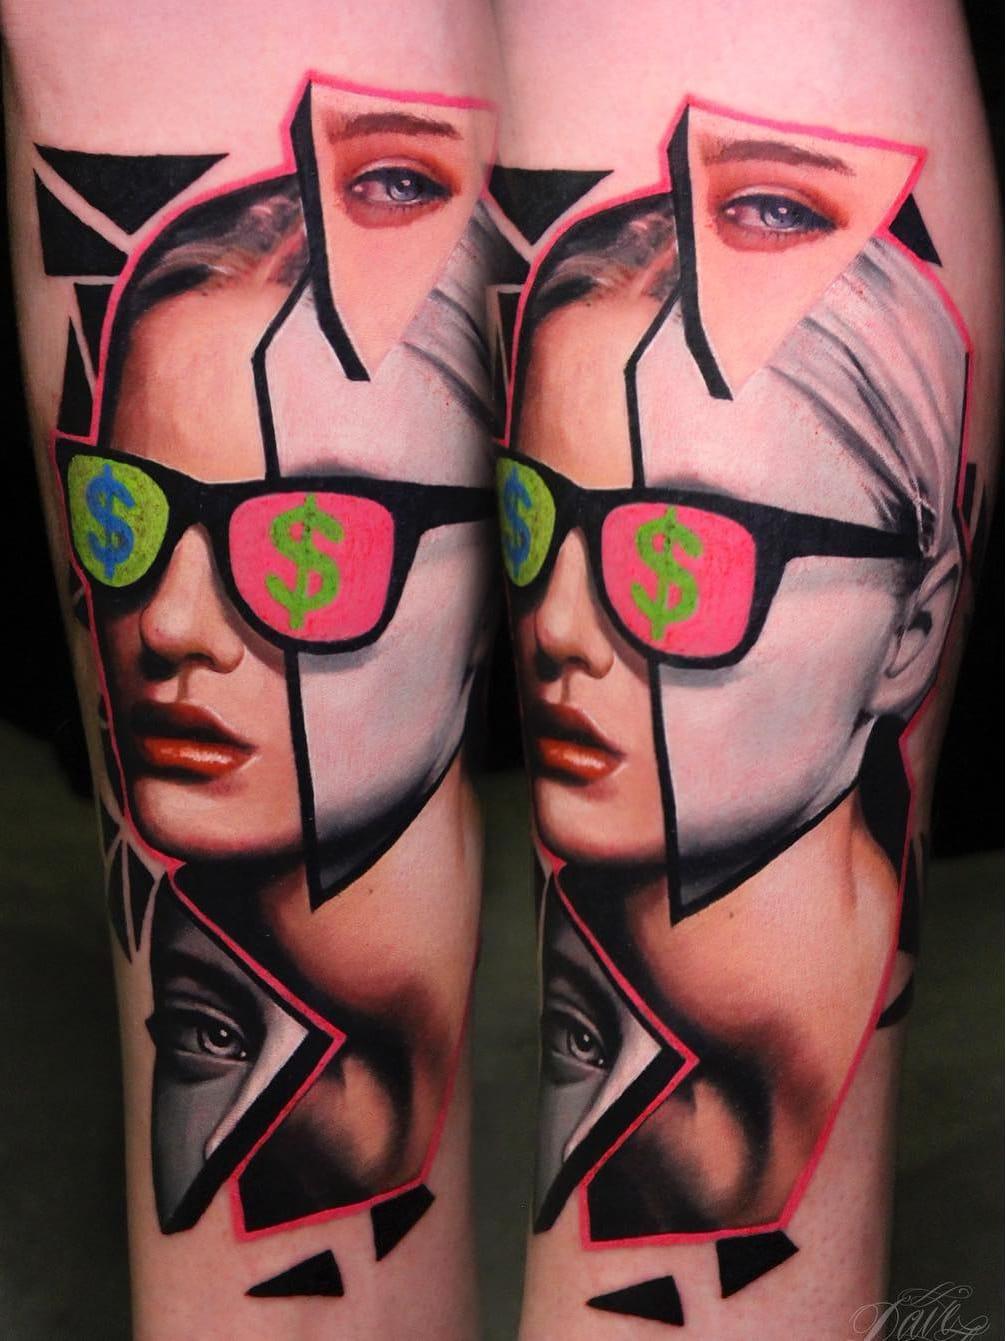 #DavePaulo #gringo #realismo #realism #colorido #colorful #portrait #retrato #colagem #collage #woman #mulher #pretoebranco #blackandwhite #oculos #glasses